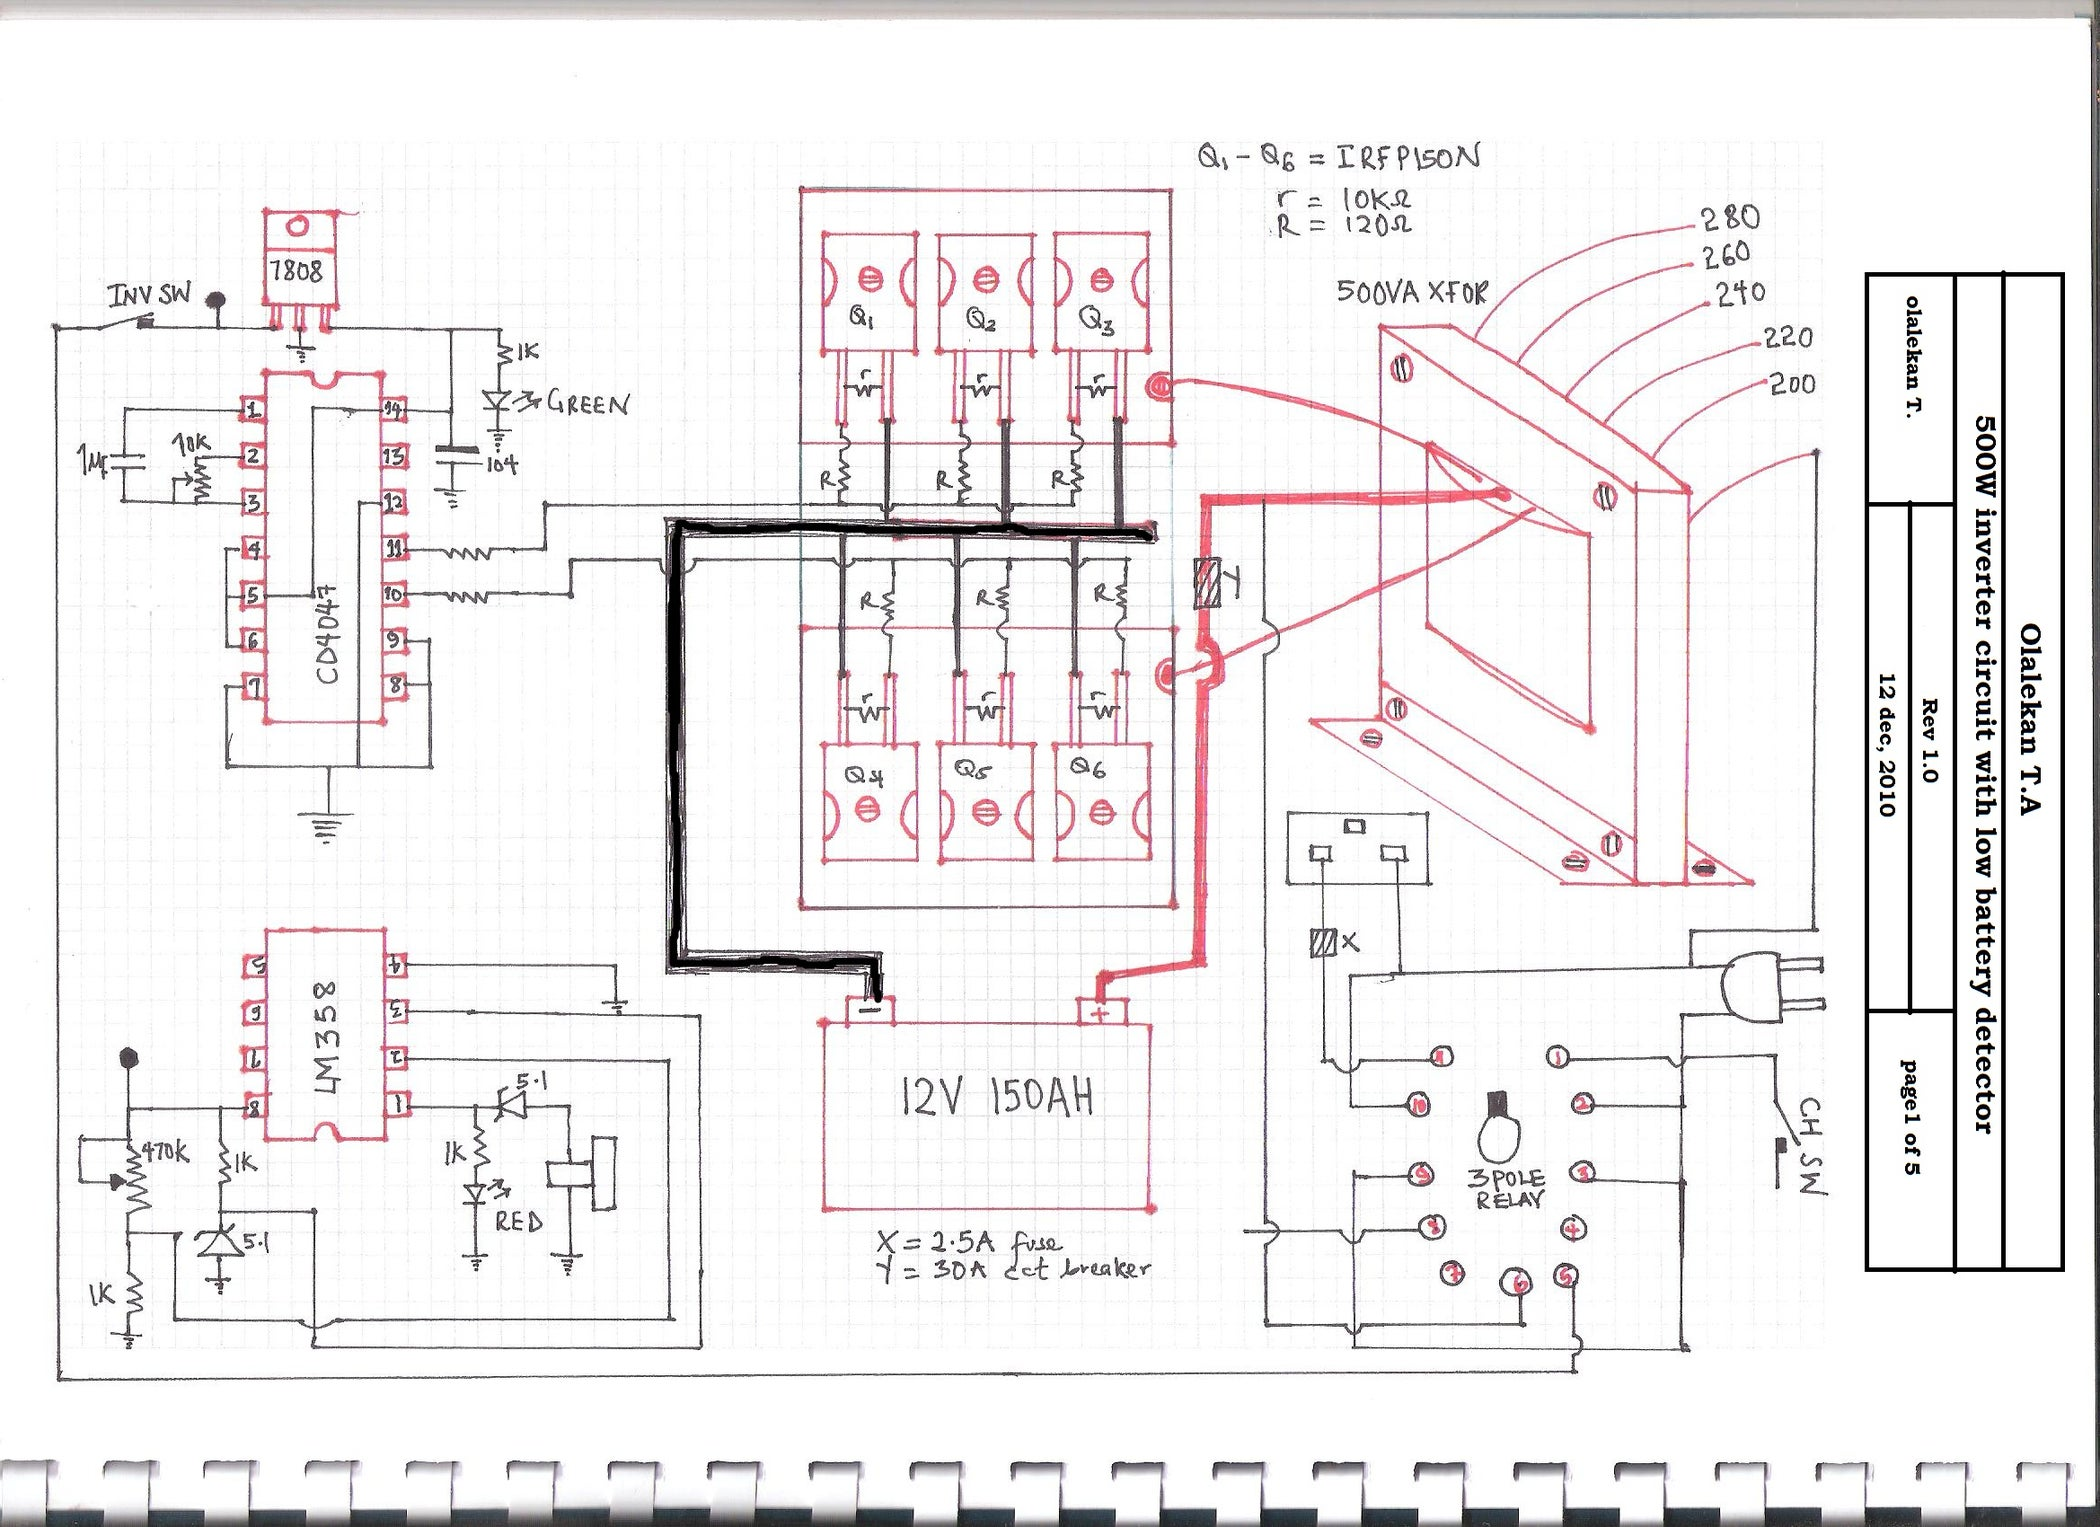 circuit diagram ups 500w circuit diagram ups 500w | wiring library simple ups circuit diagram #12